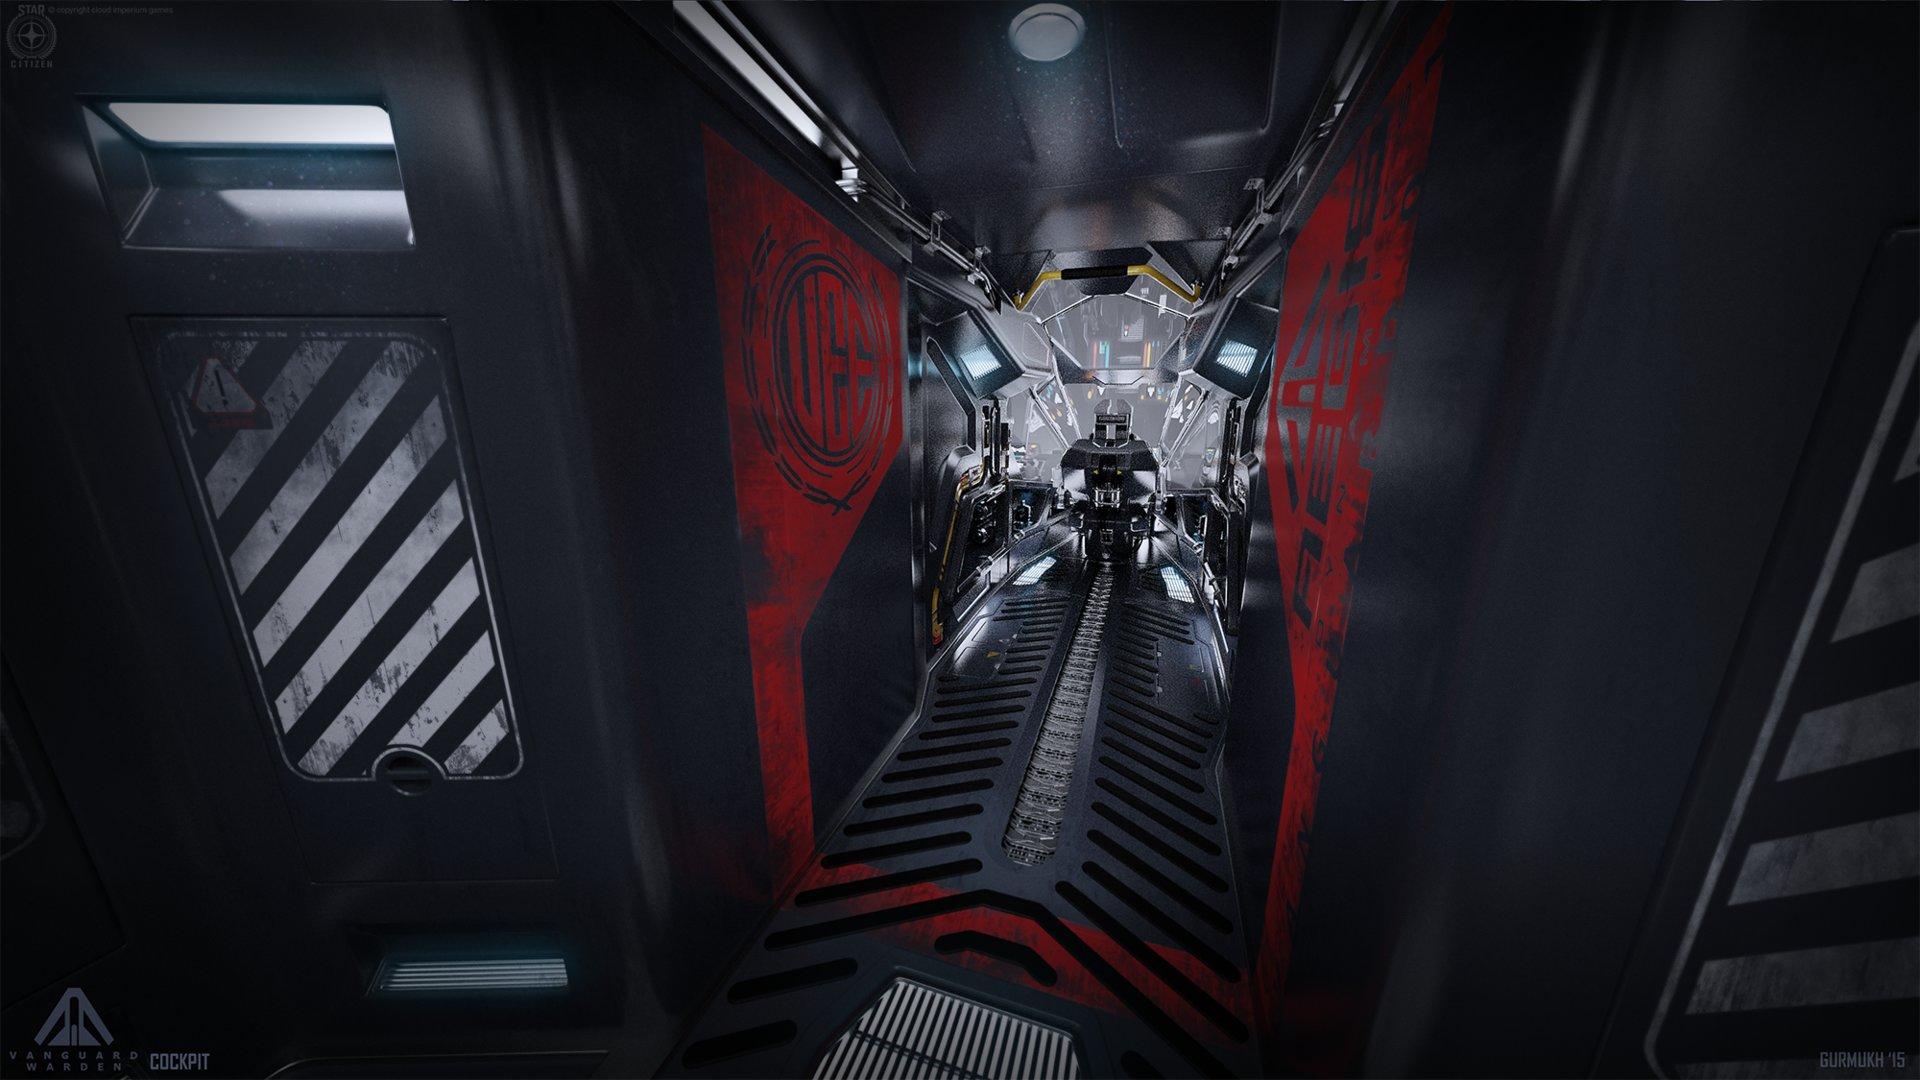 Gurmukh bhasin 013 vanguard warden cockpitgurmukh